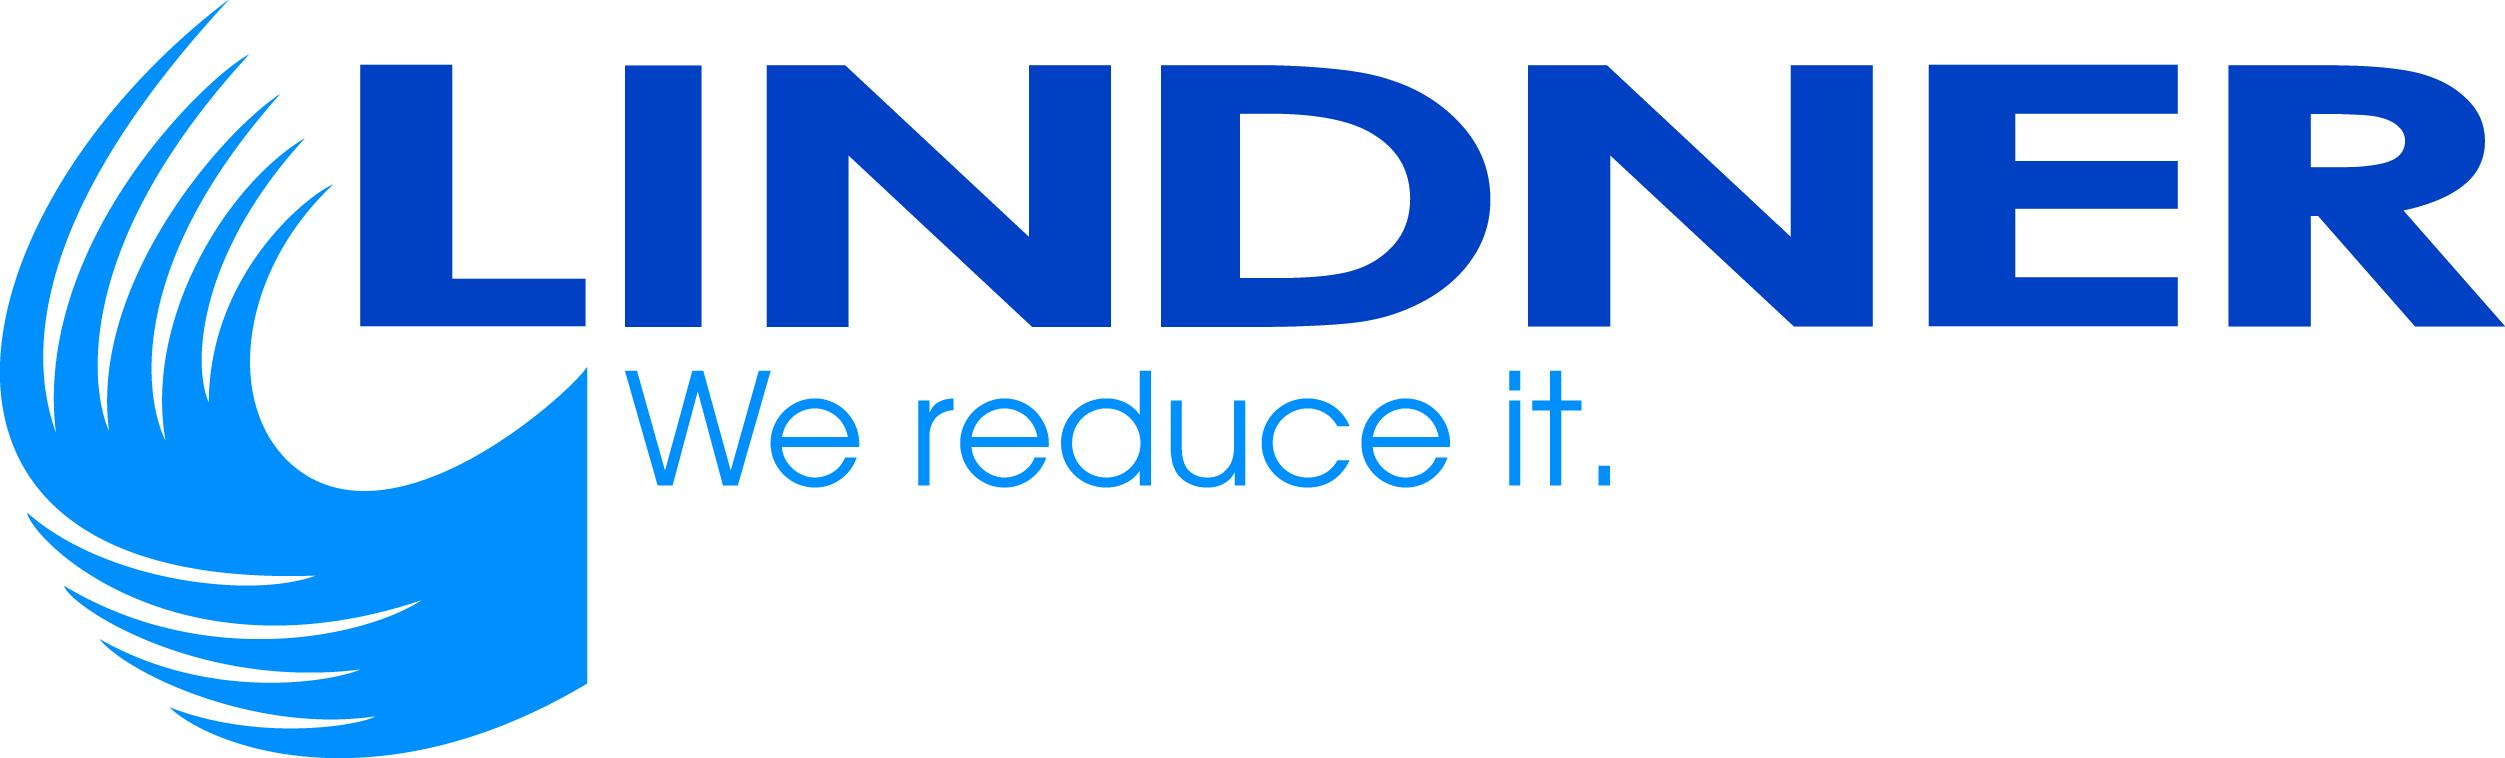 lindner-wri-logo-4c.jpg